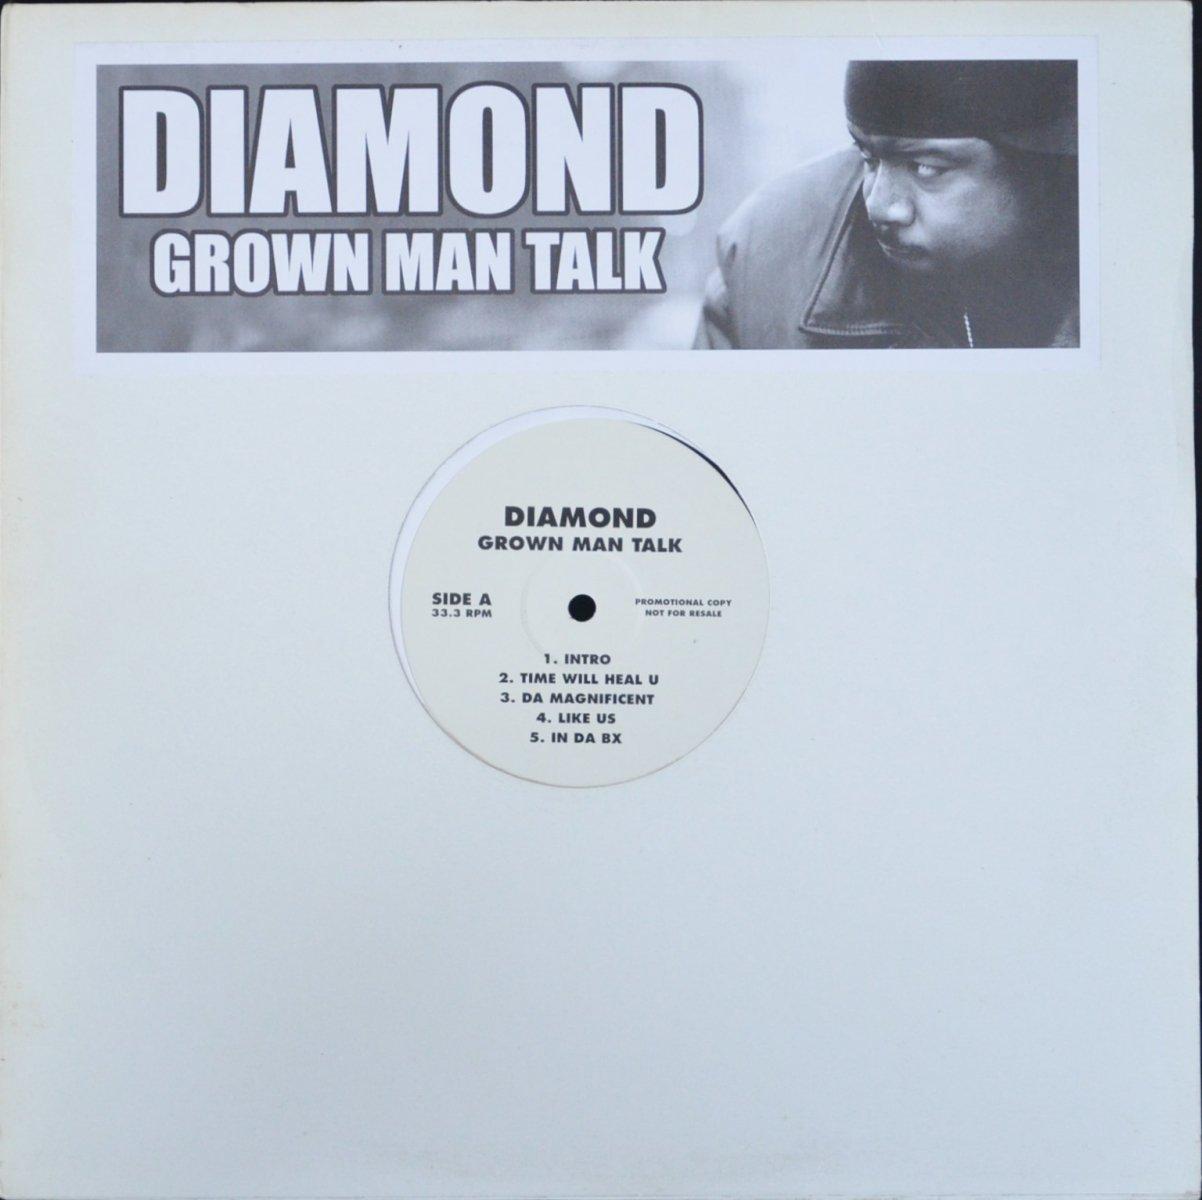 DIAMOND / GROWN MAN TALK (2LP)